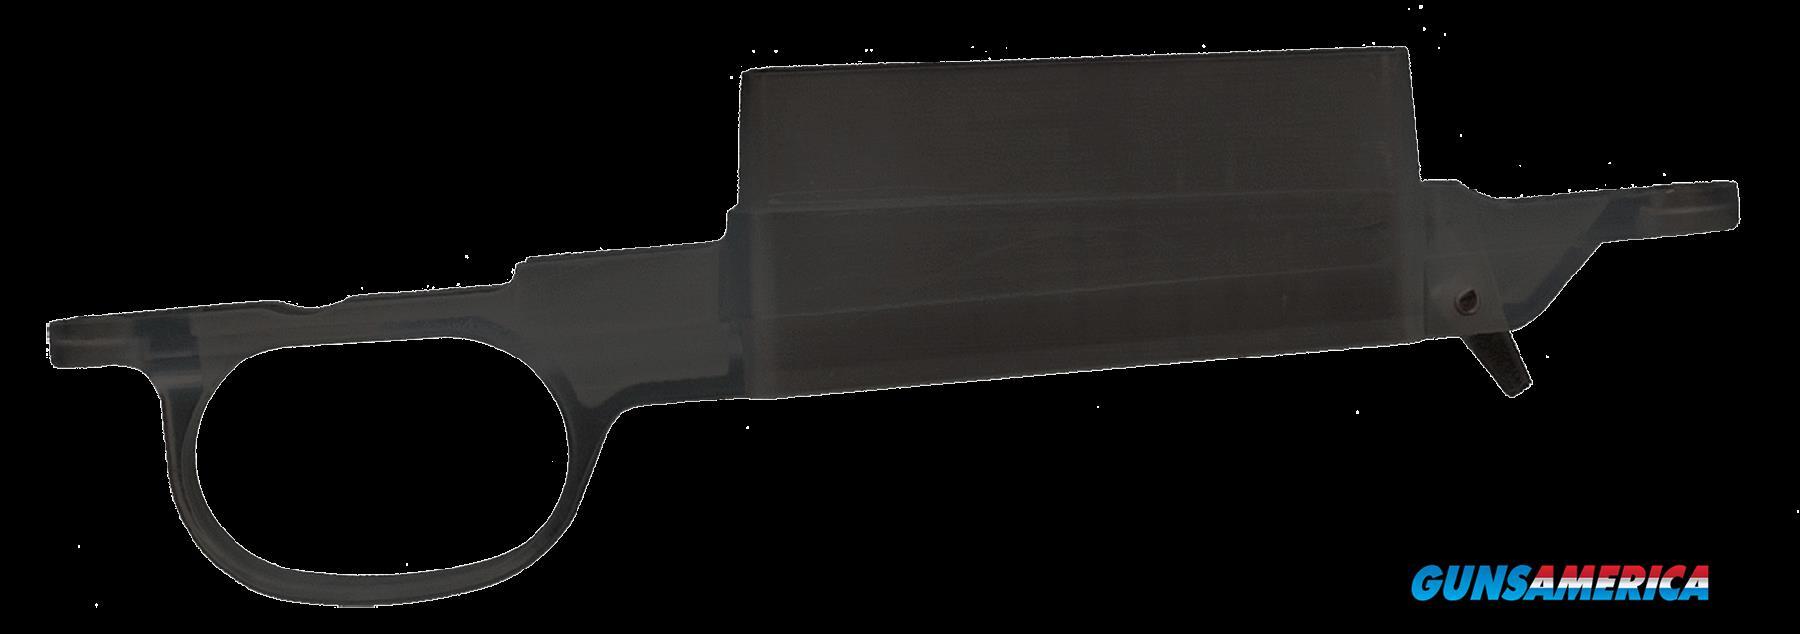 Howa Ammo Boost Floorplate, Howa Atifpm1500   M1500 Sa Dm Floorplate  Guns > Pistols > 1911 Pistol Copies (non-Colt)